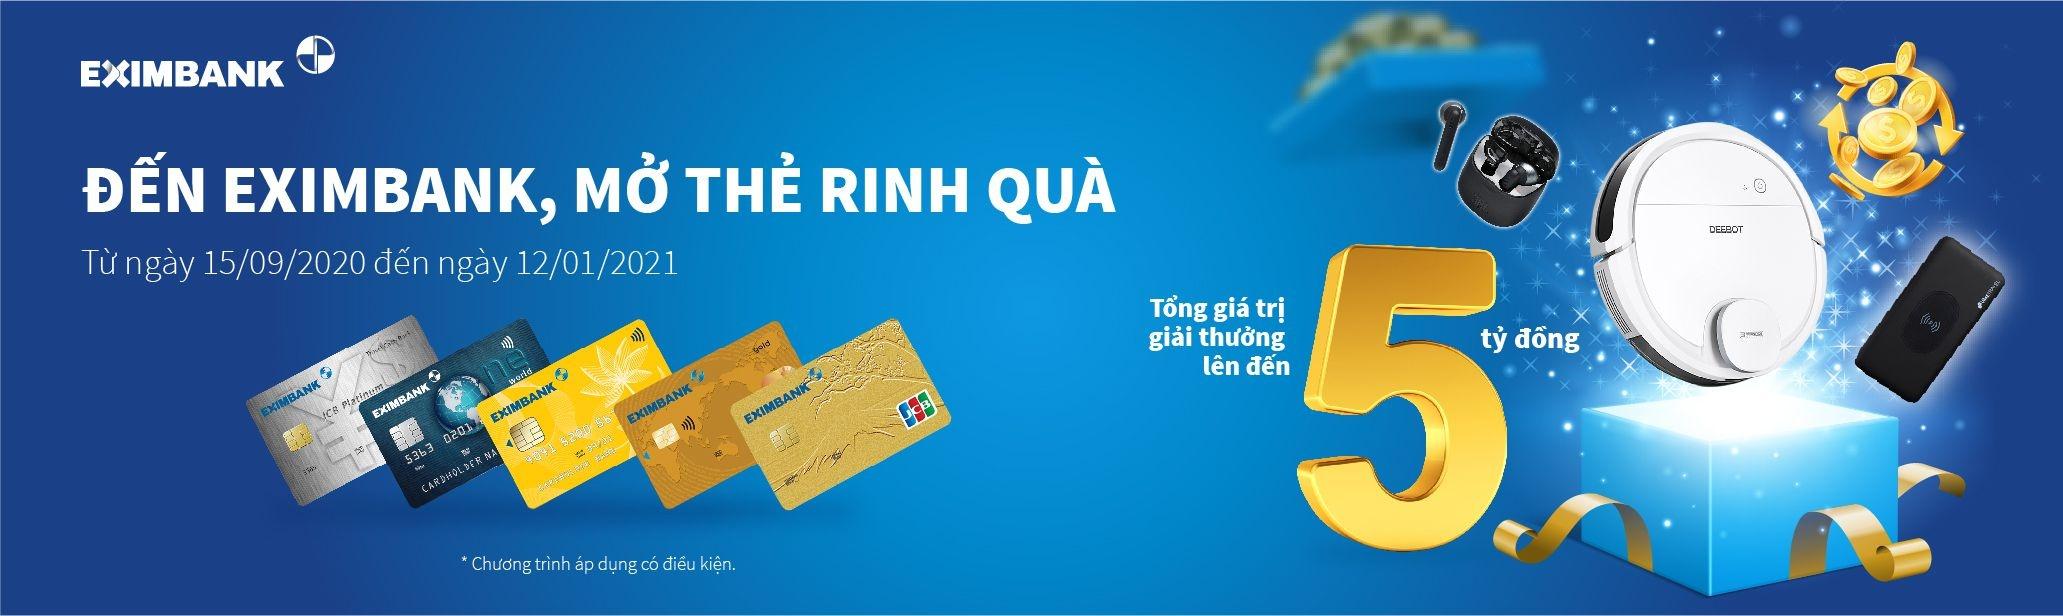 eximbank nhan giai thuong tu to chuc the quoc te jcb